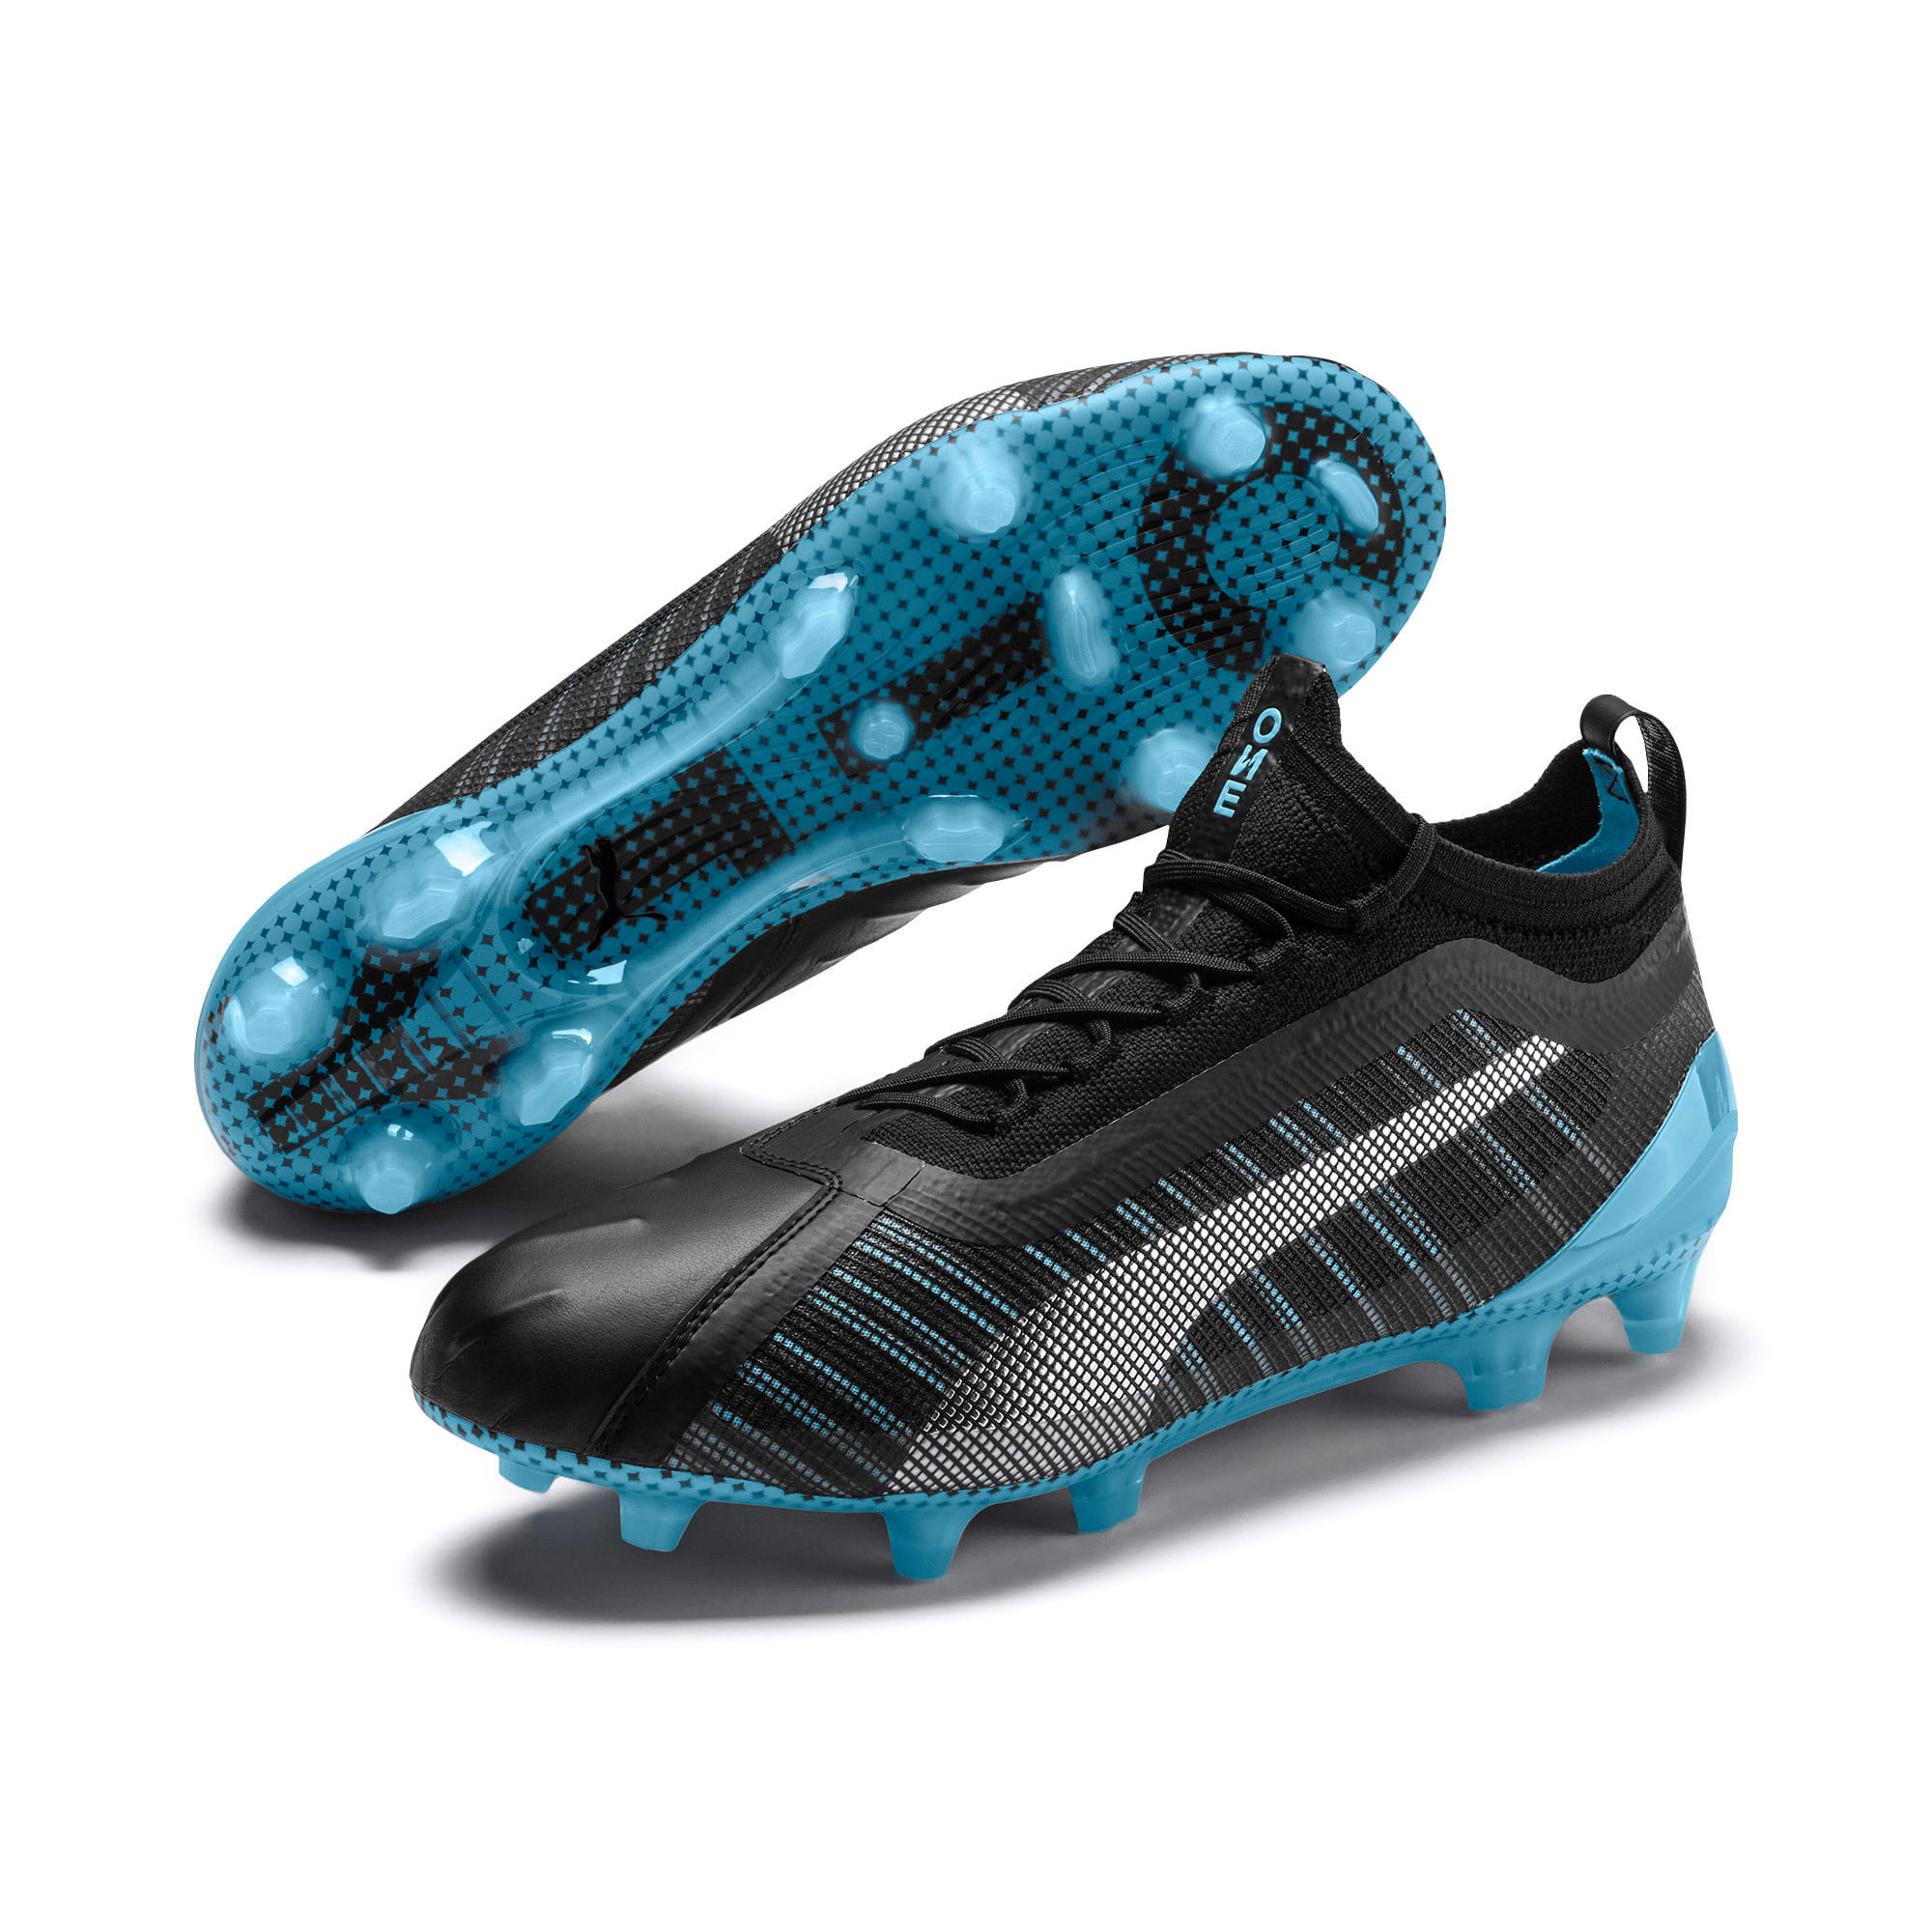 Thumbnail 3 of PUMA ONE 5.1 City FG/AG Men's Soccer Cleats, Black-Sky Blue-Silver, medium